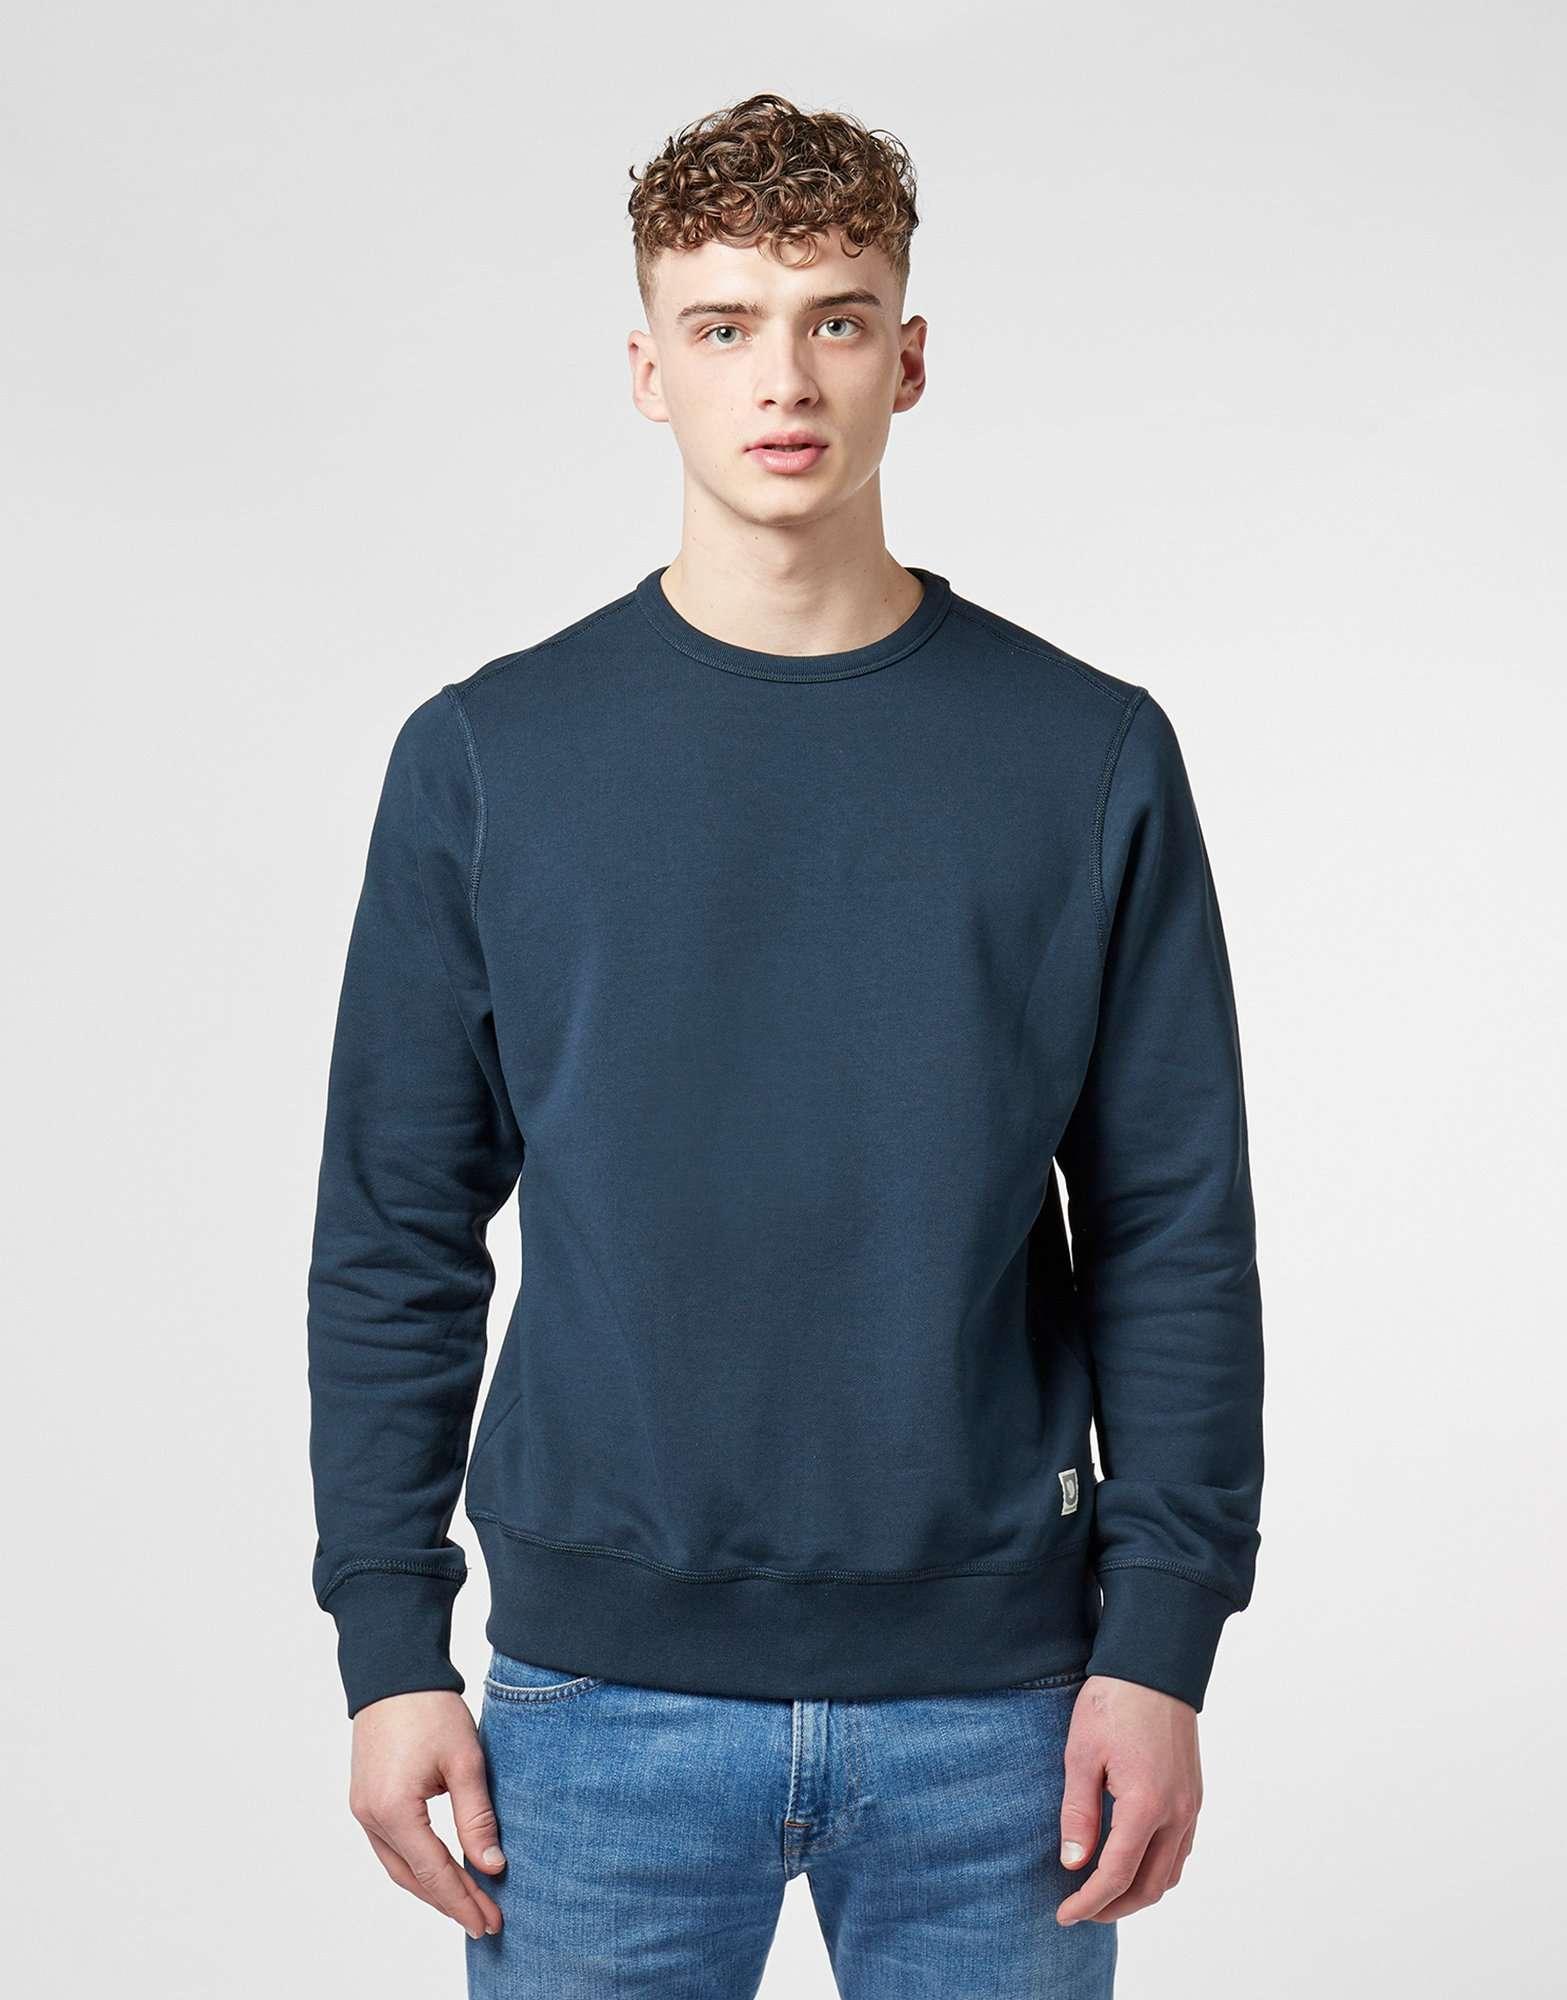 Fjallraven Greenland Sweatshirt